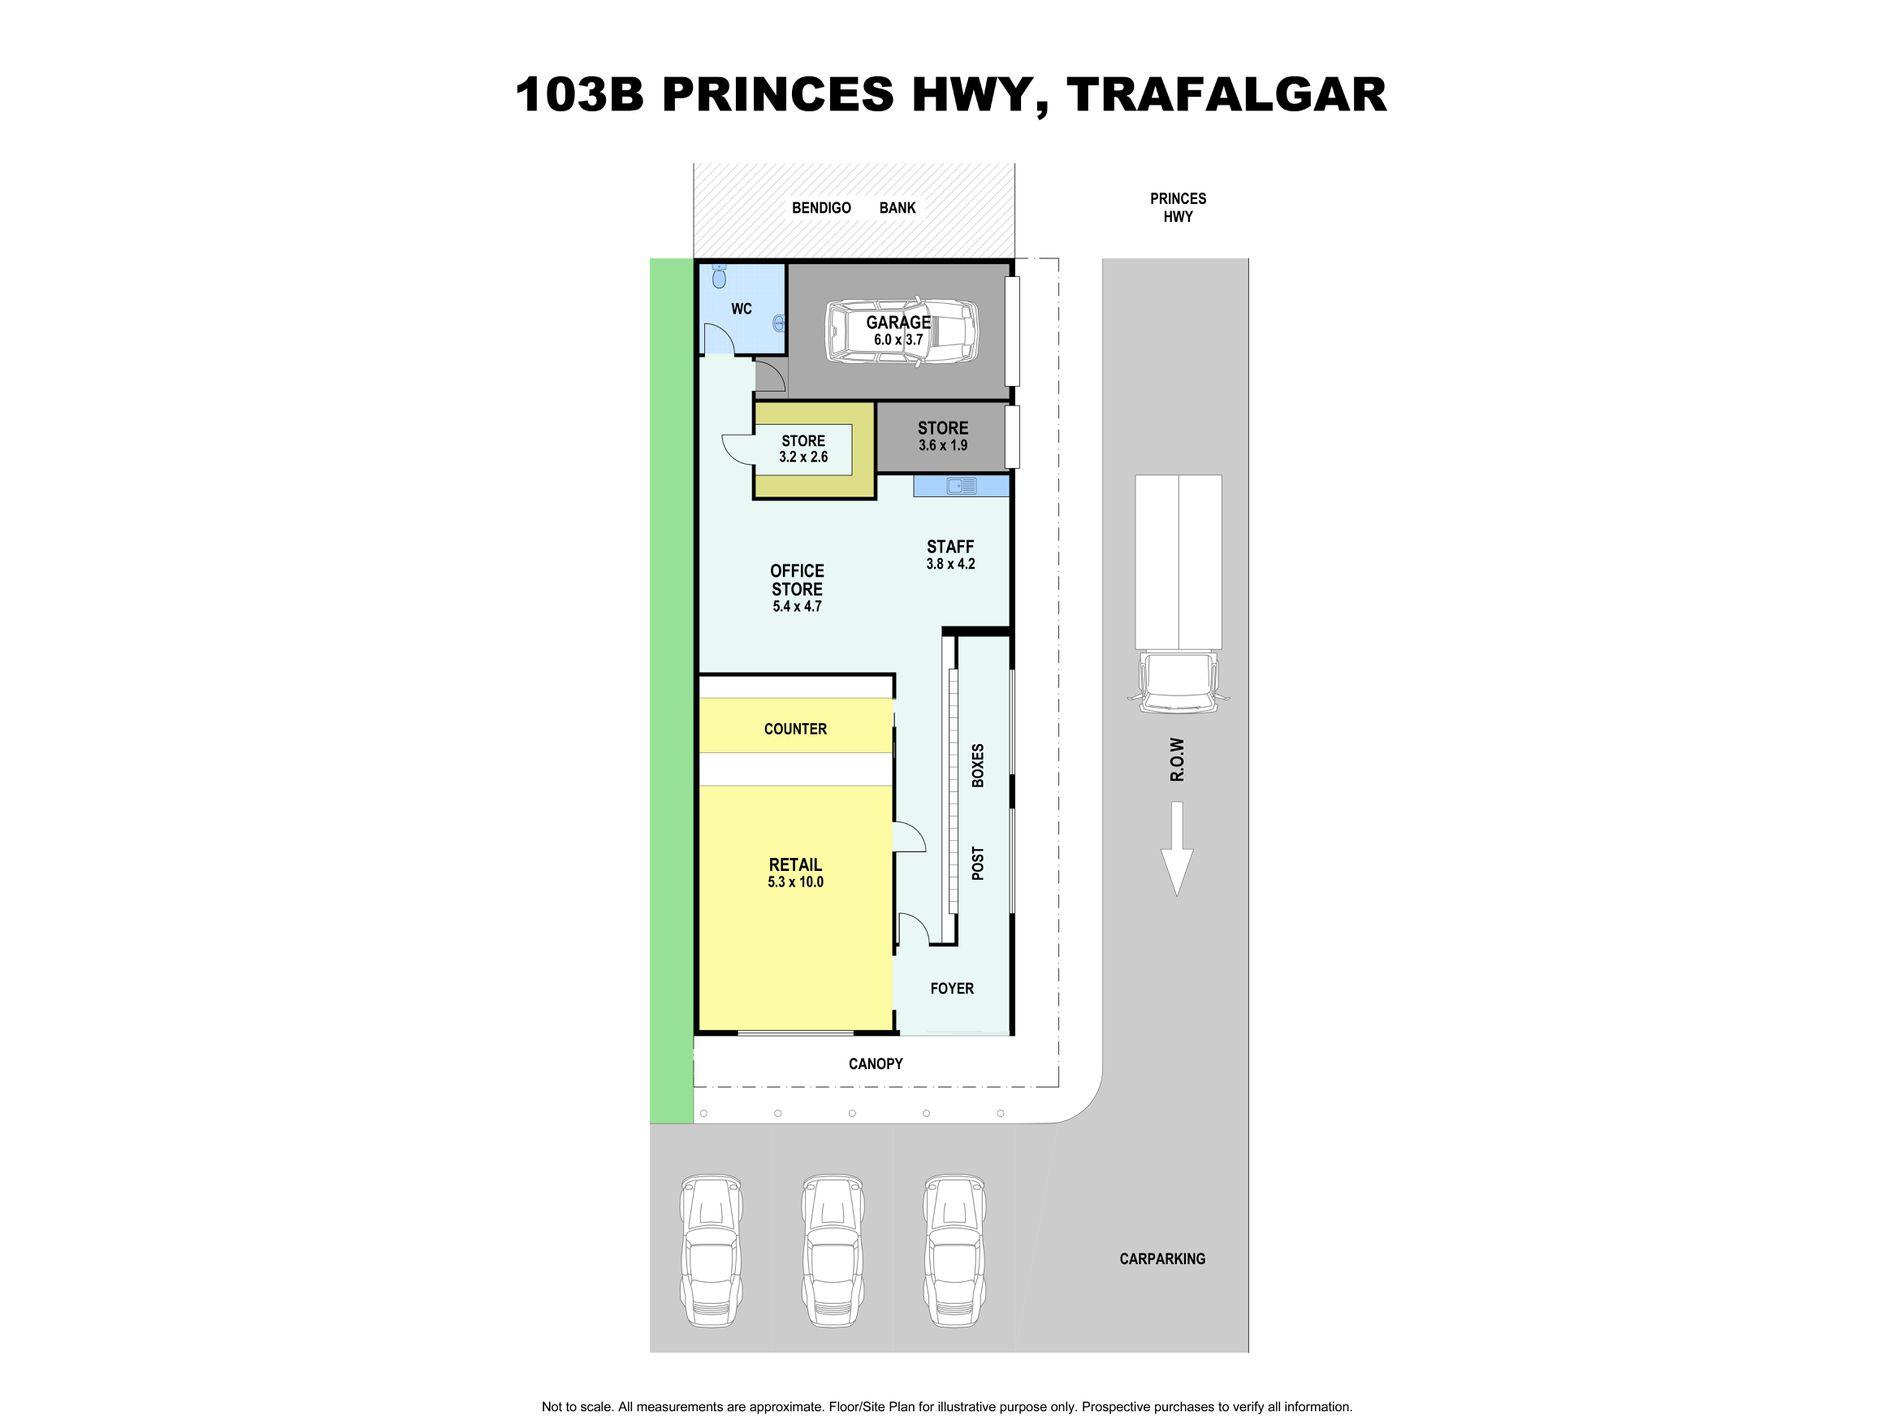 103B Princes Highway, Trafalgar